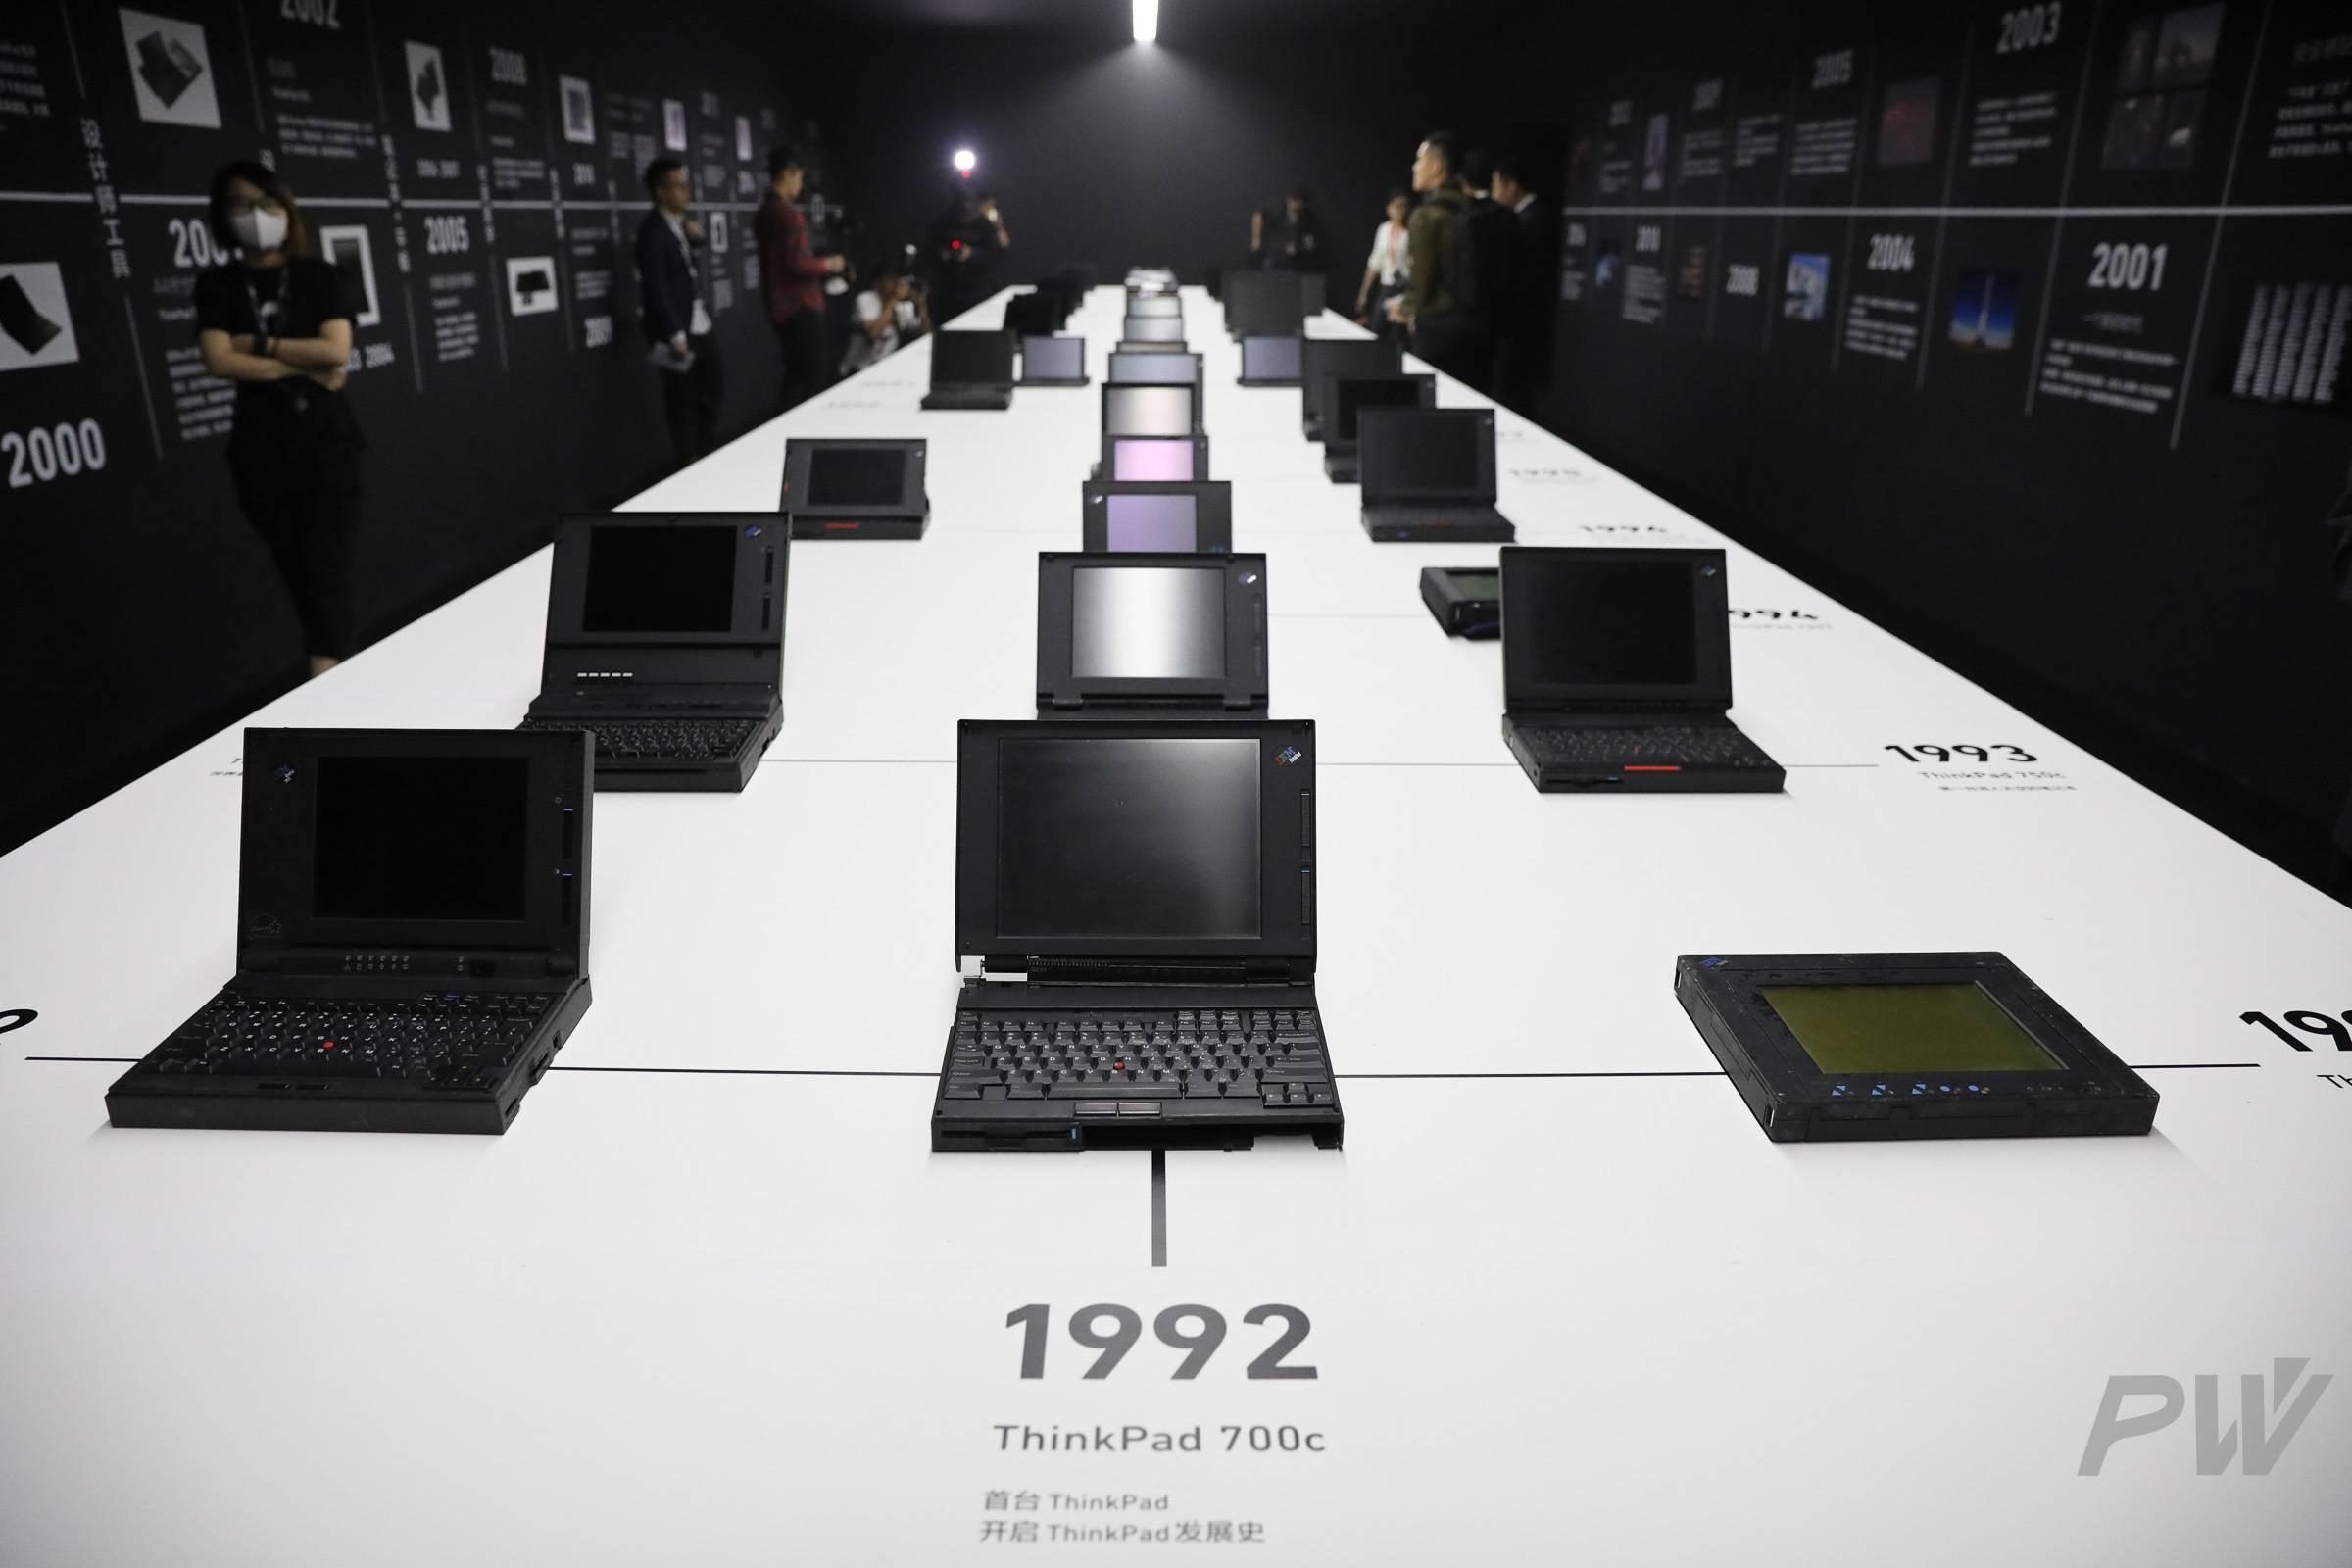 前排正中间这台就是 1992 年的 ThinkPad 700C。图片:Hao Ying。